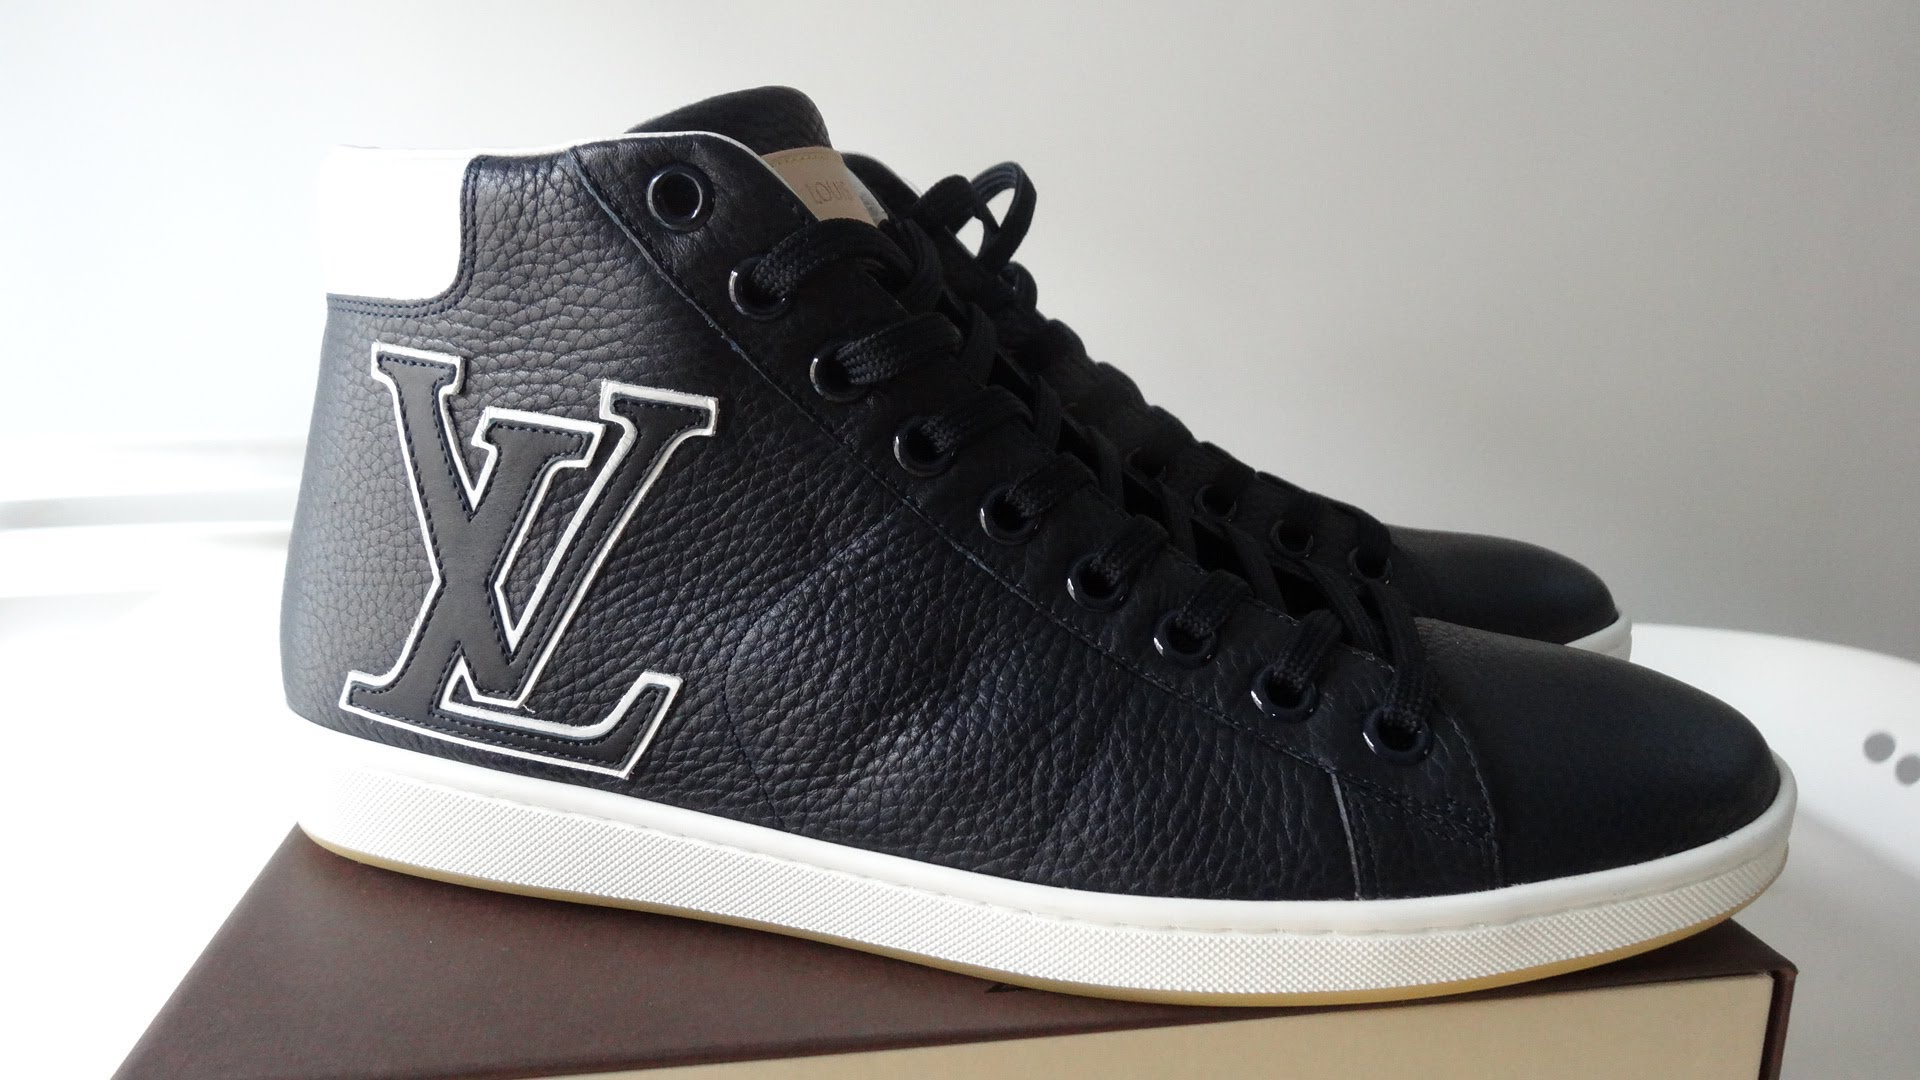 Louis vuitton sneakers on ebay